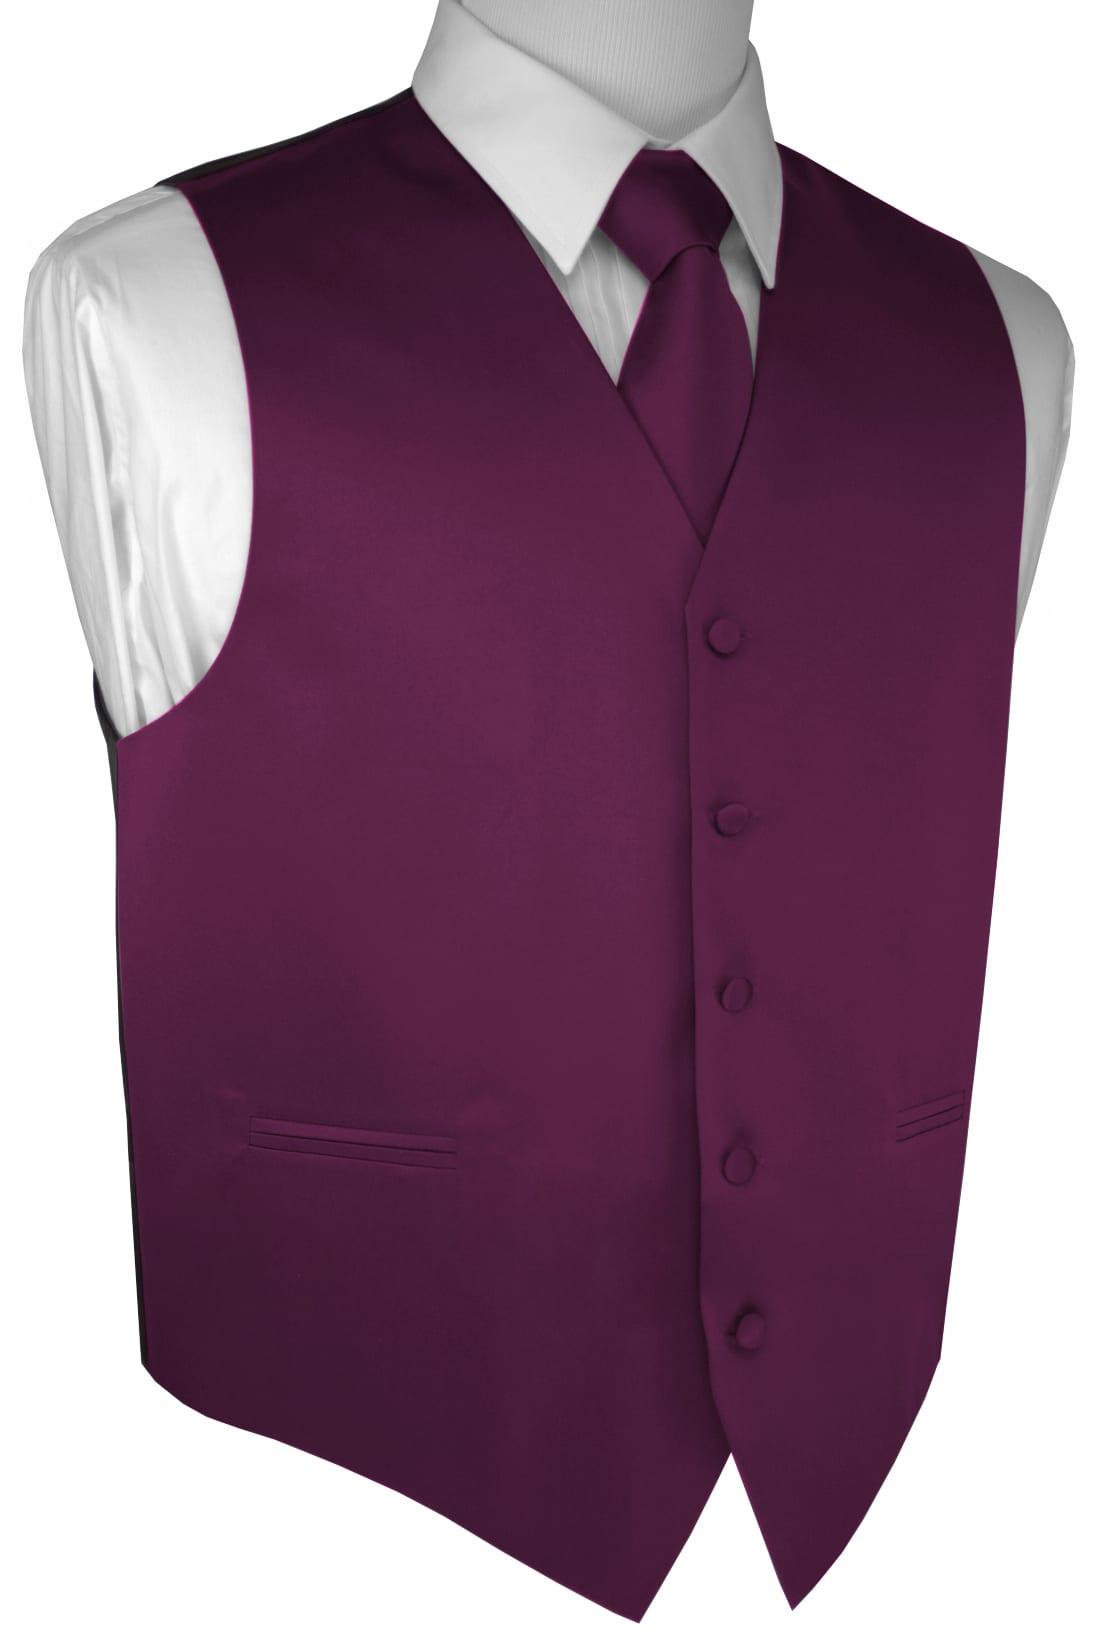 Dress Wedding Tie and Hankie Formal Men/'s Solid Satin Tuxedo Vest Prom